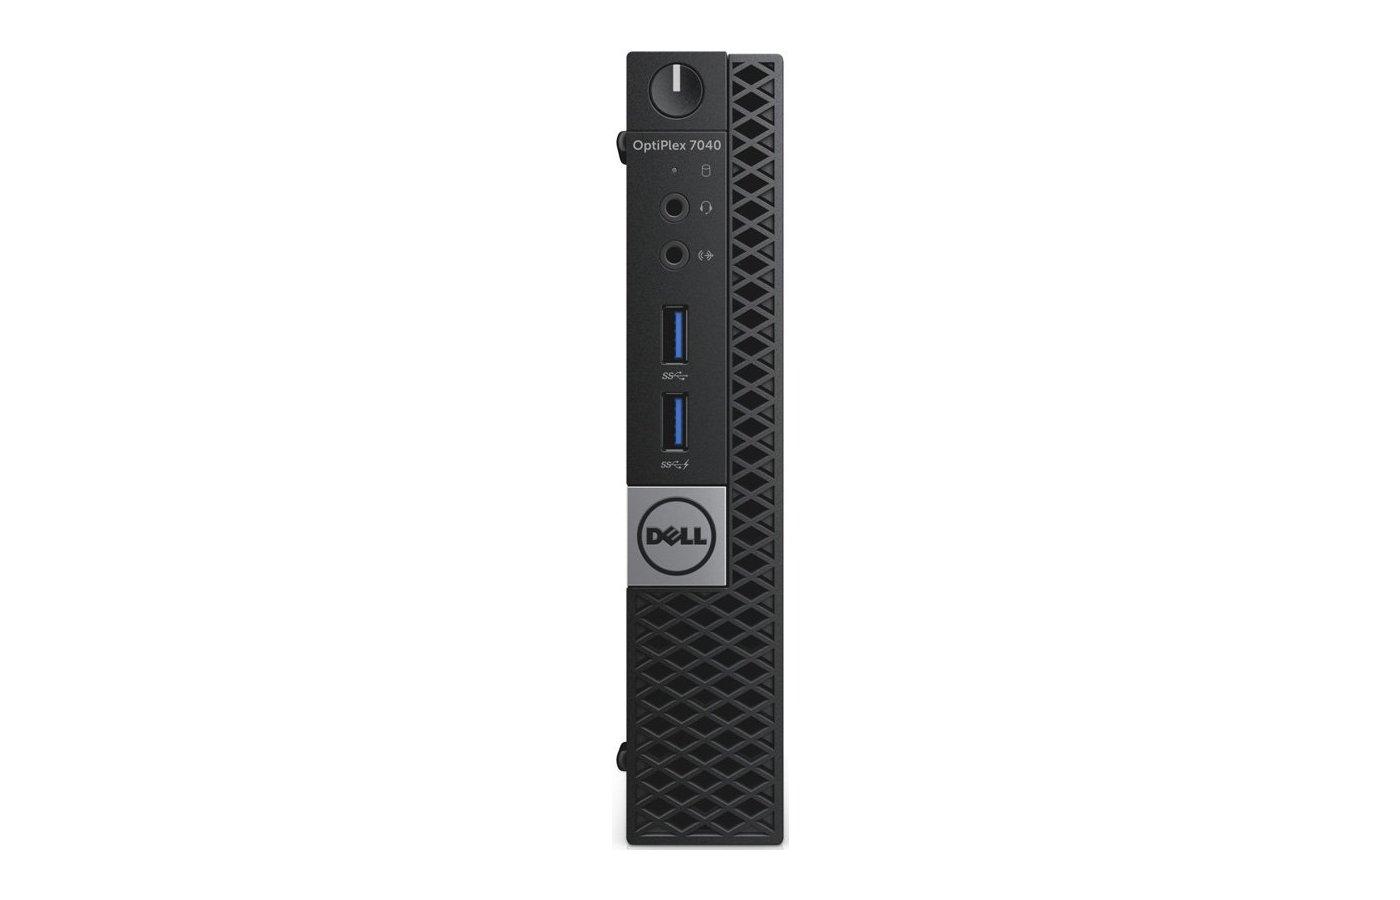 Системный блок Dell OptiPlex 7040 Micro /7040-0125/